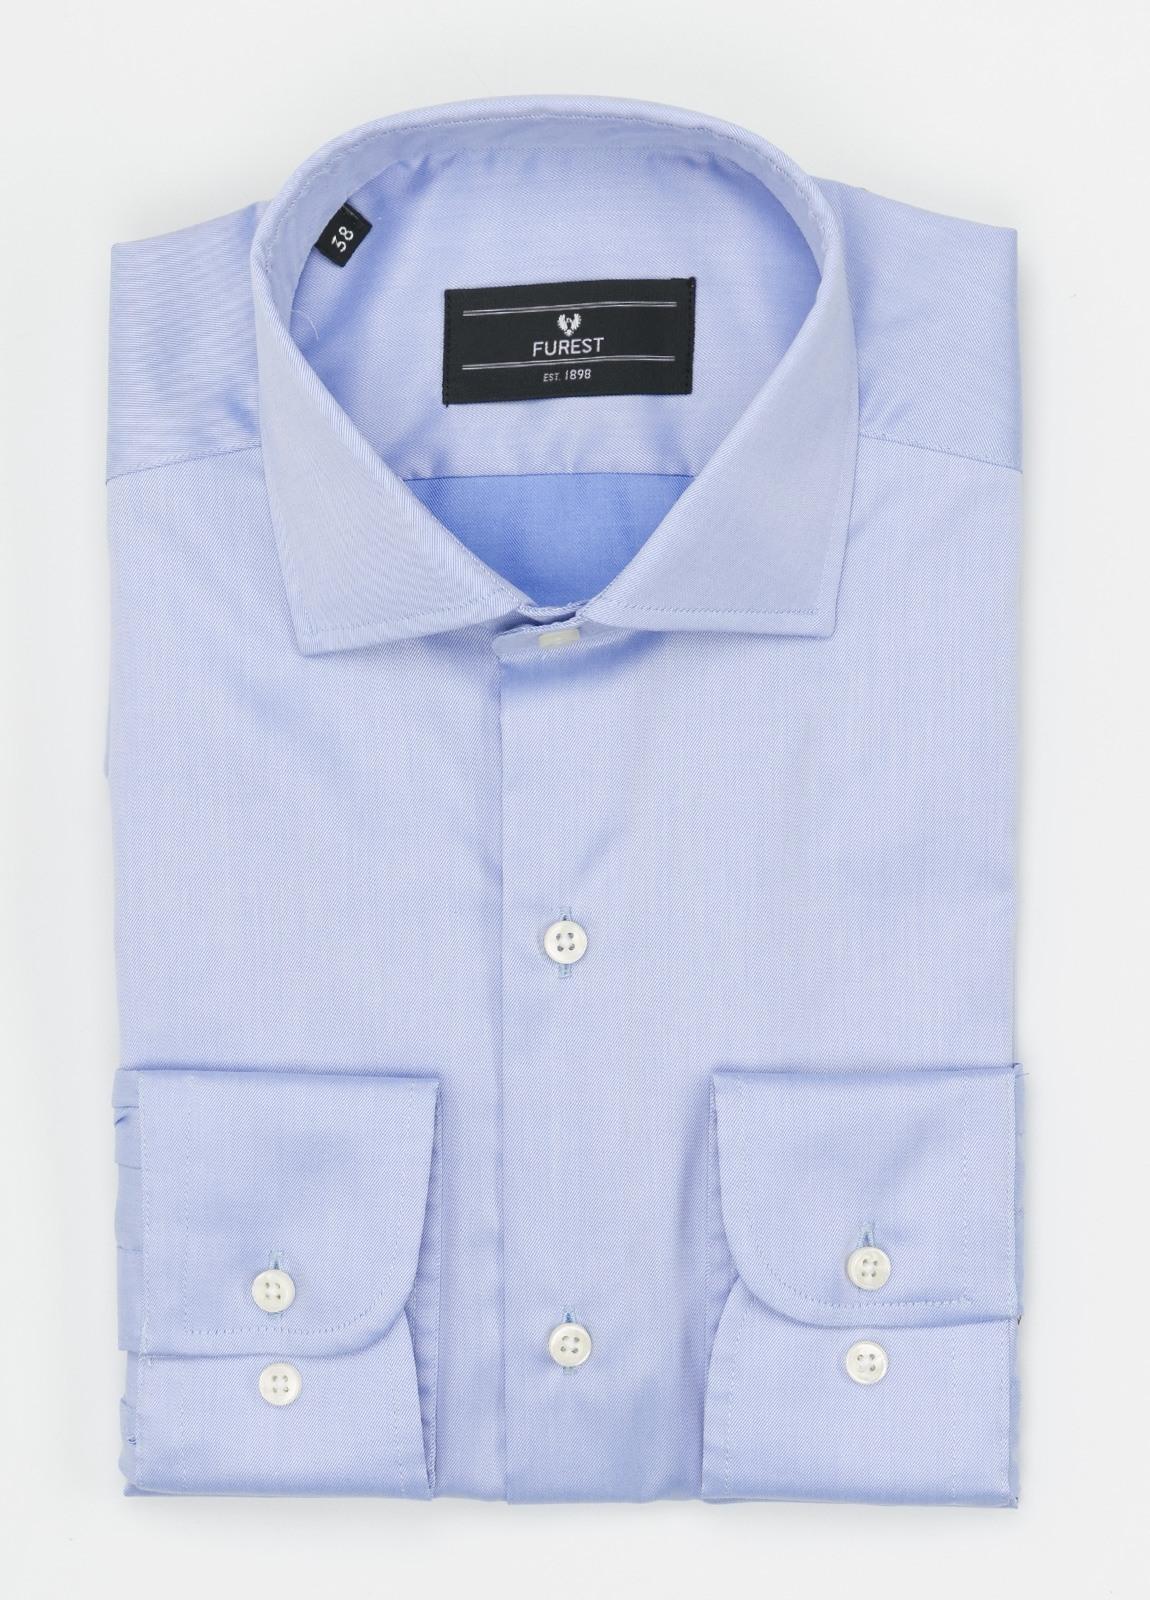 Camisa Formal Wear REGULAR FIT cuello italiano modelo TAILORED NAPOLI, diseño liso color azul celeste, 100% Algodón.